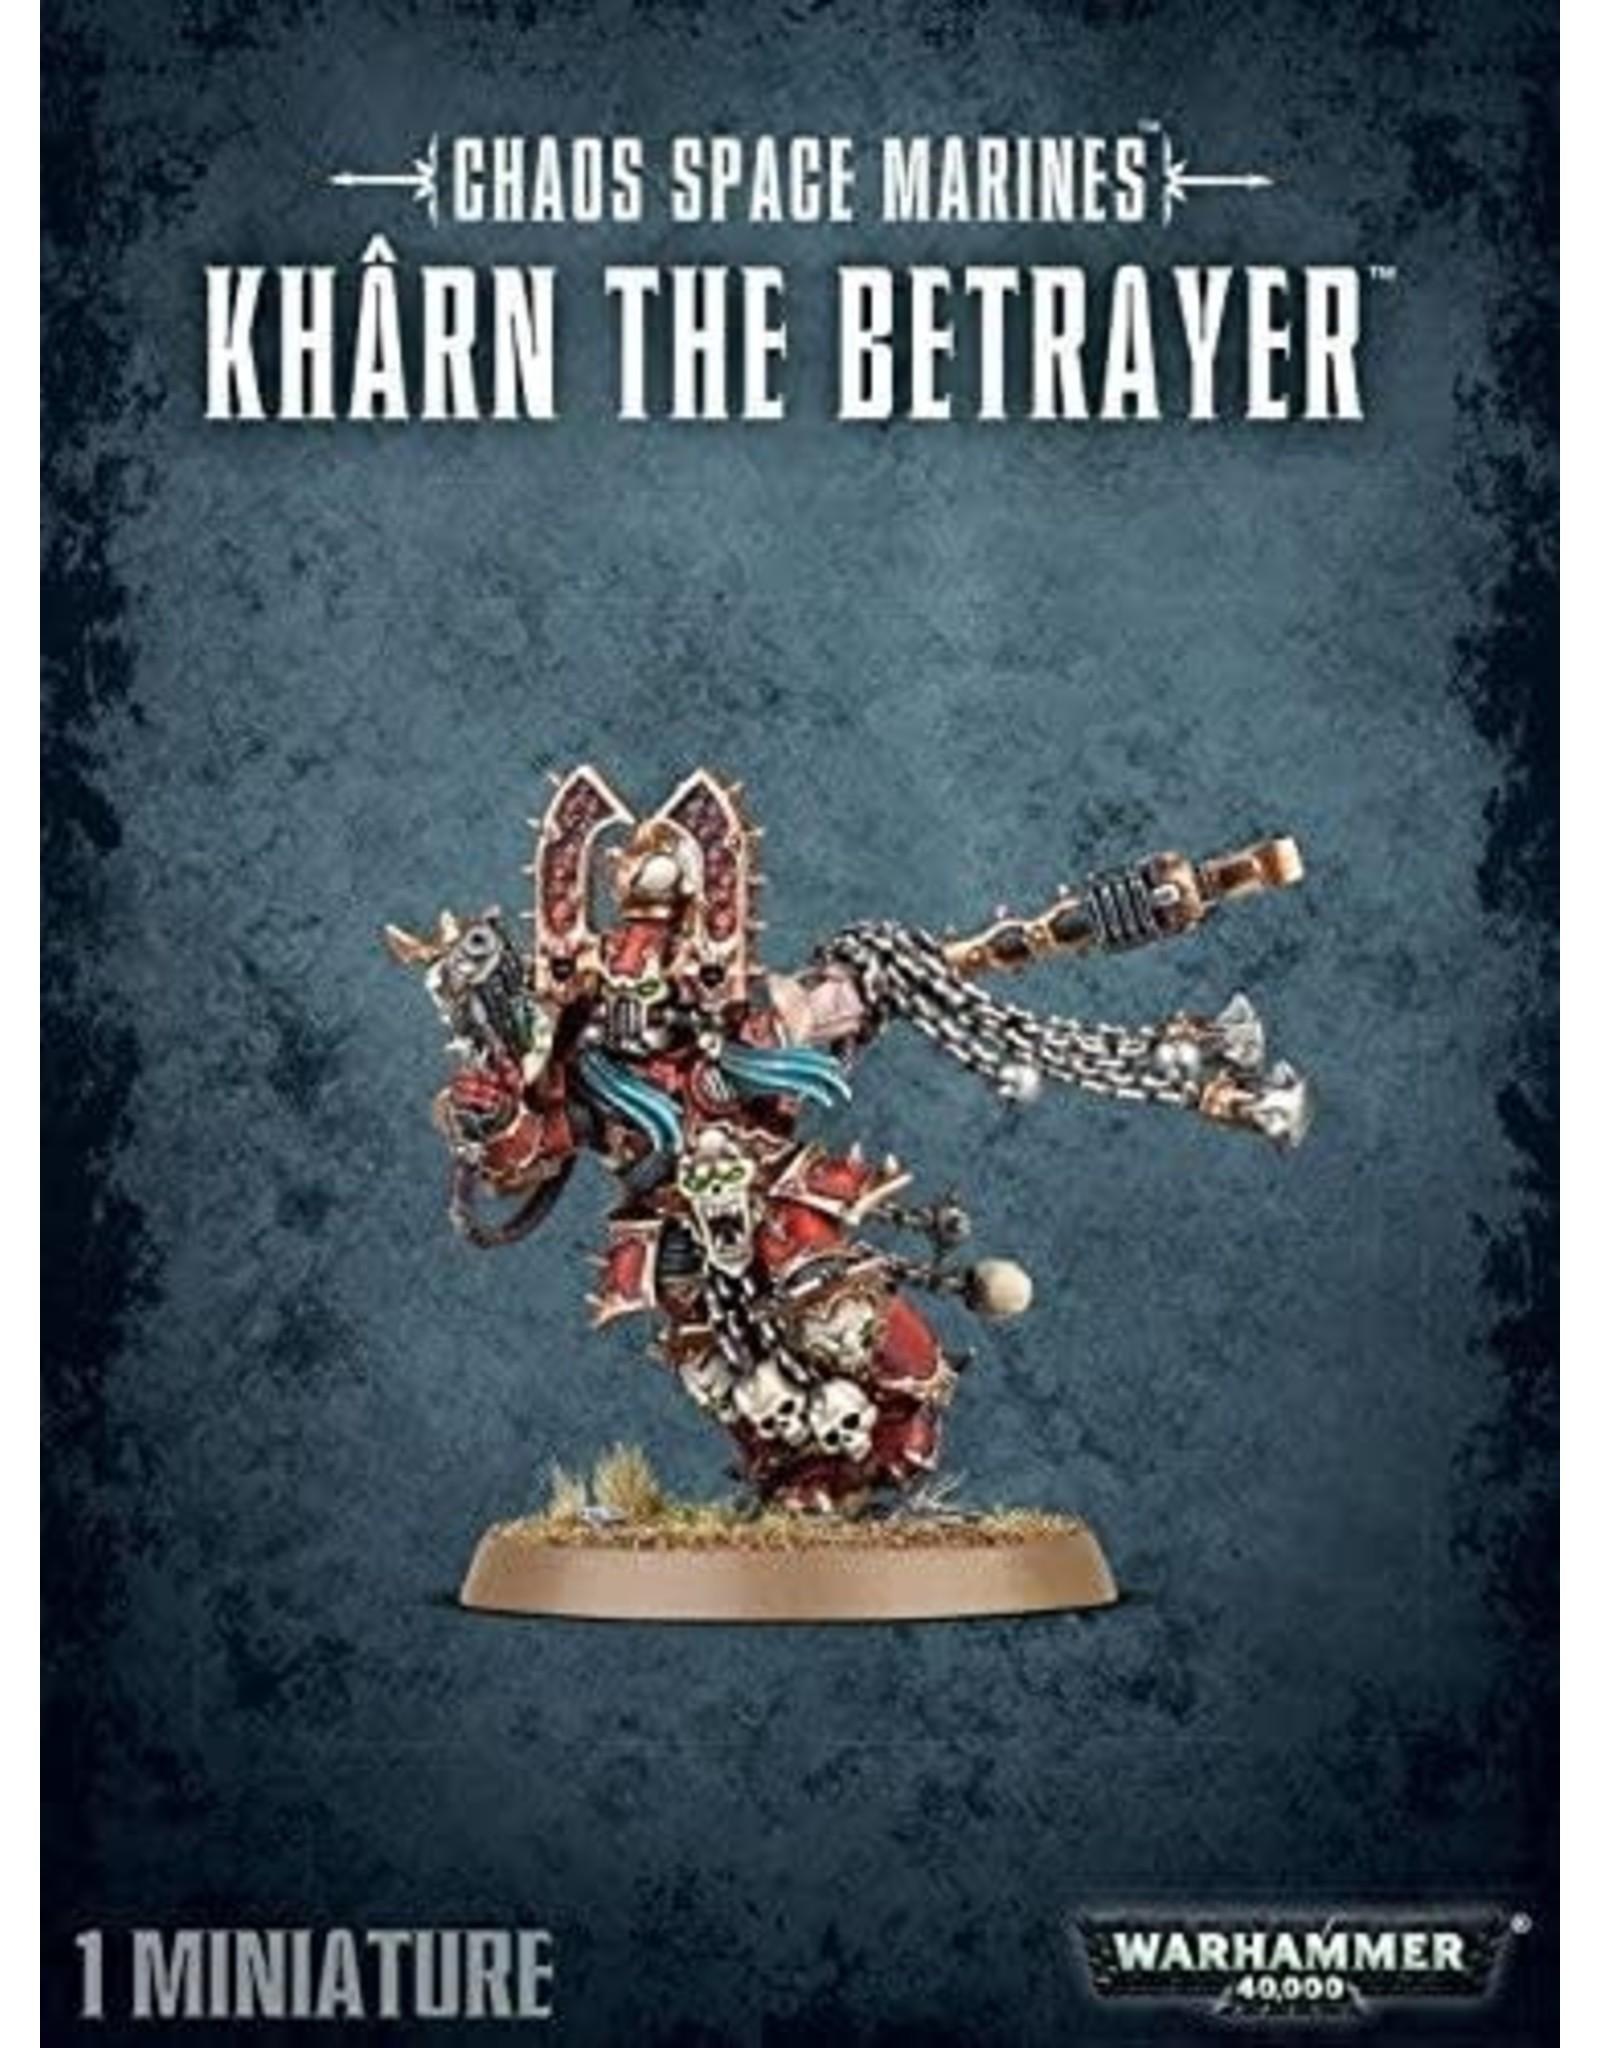 Warhammer 40k CHAOS SPACE MARINES KHARN THE BETRAYER